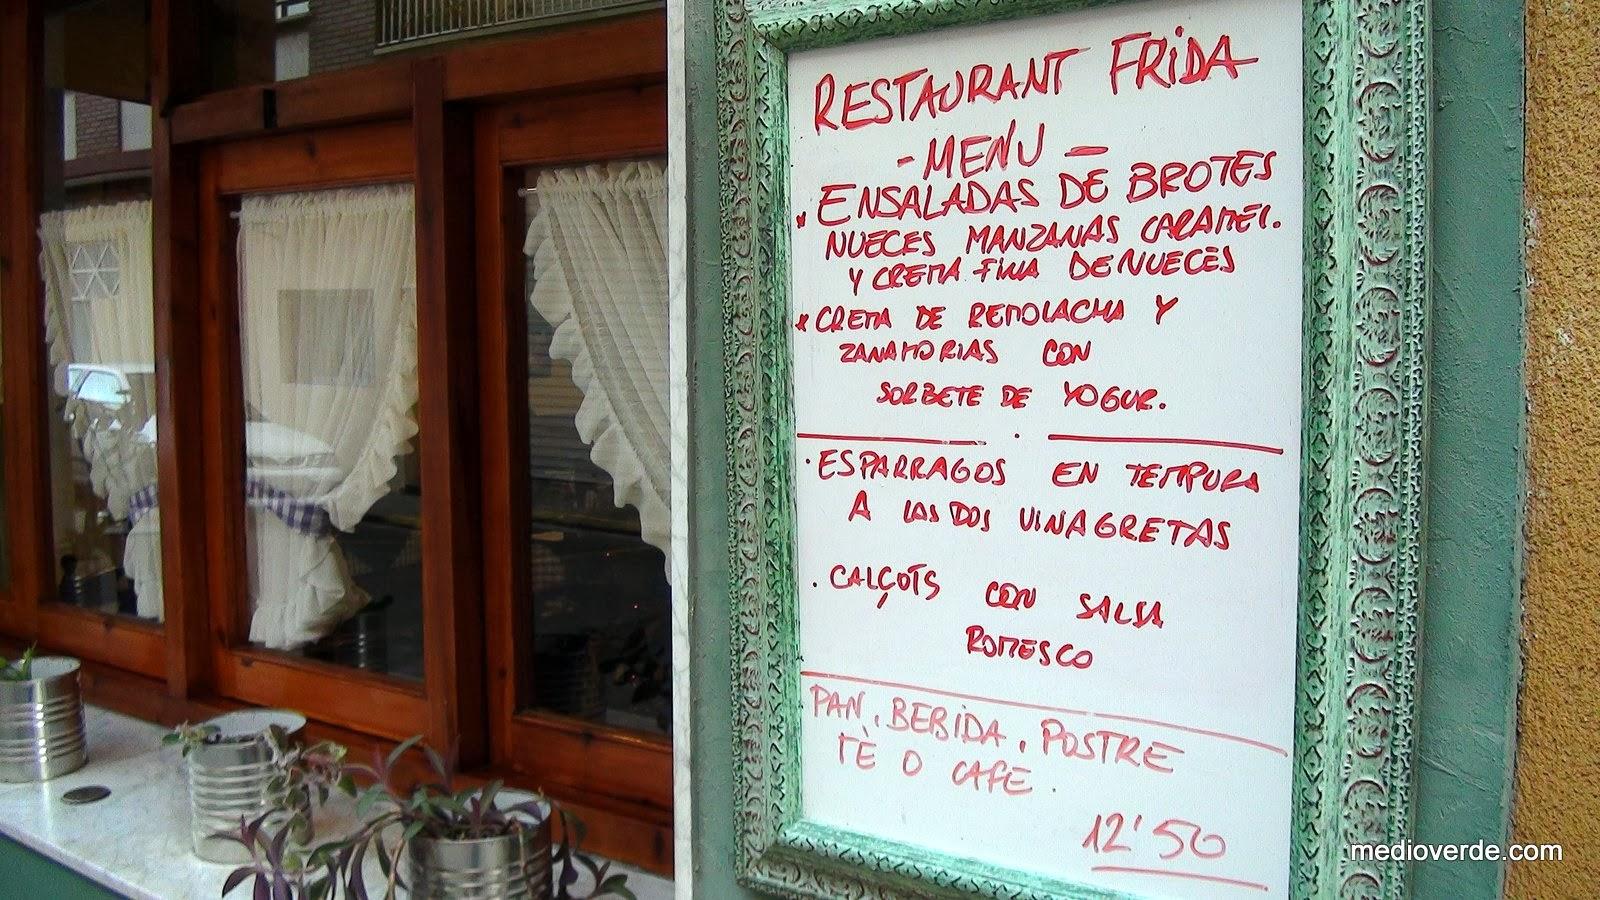 Frida sagasta 6 valencia espa a - Restaurantes en puerto de sagunto ...